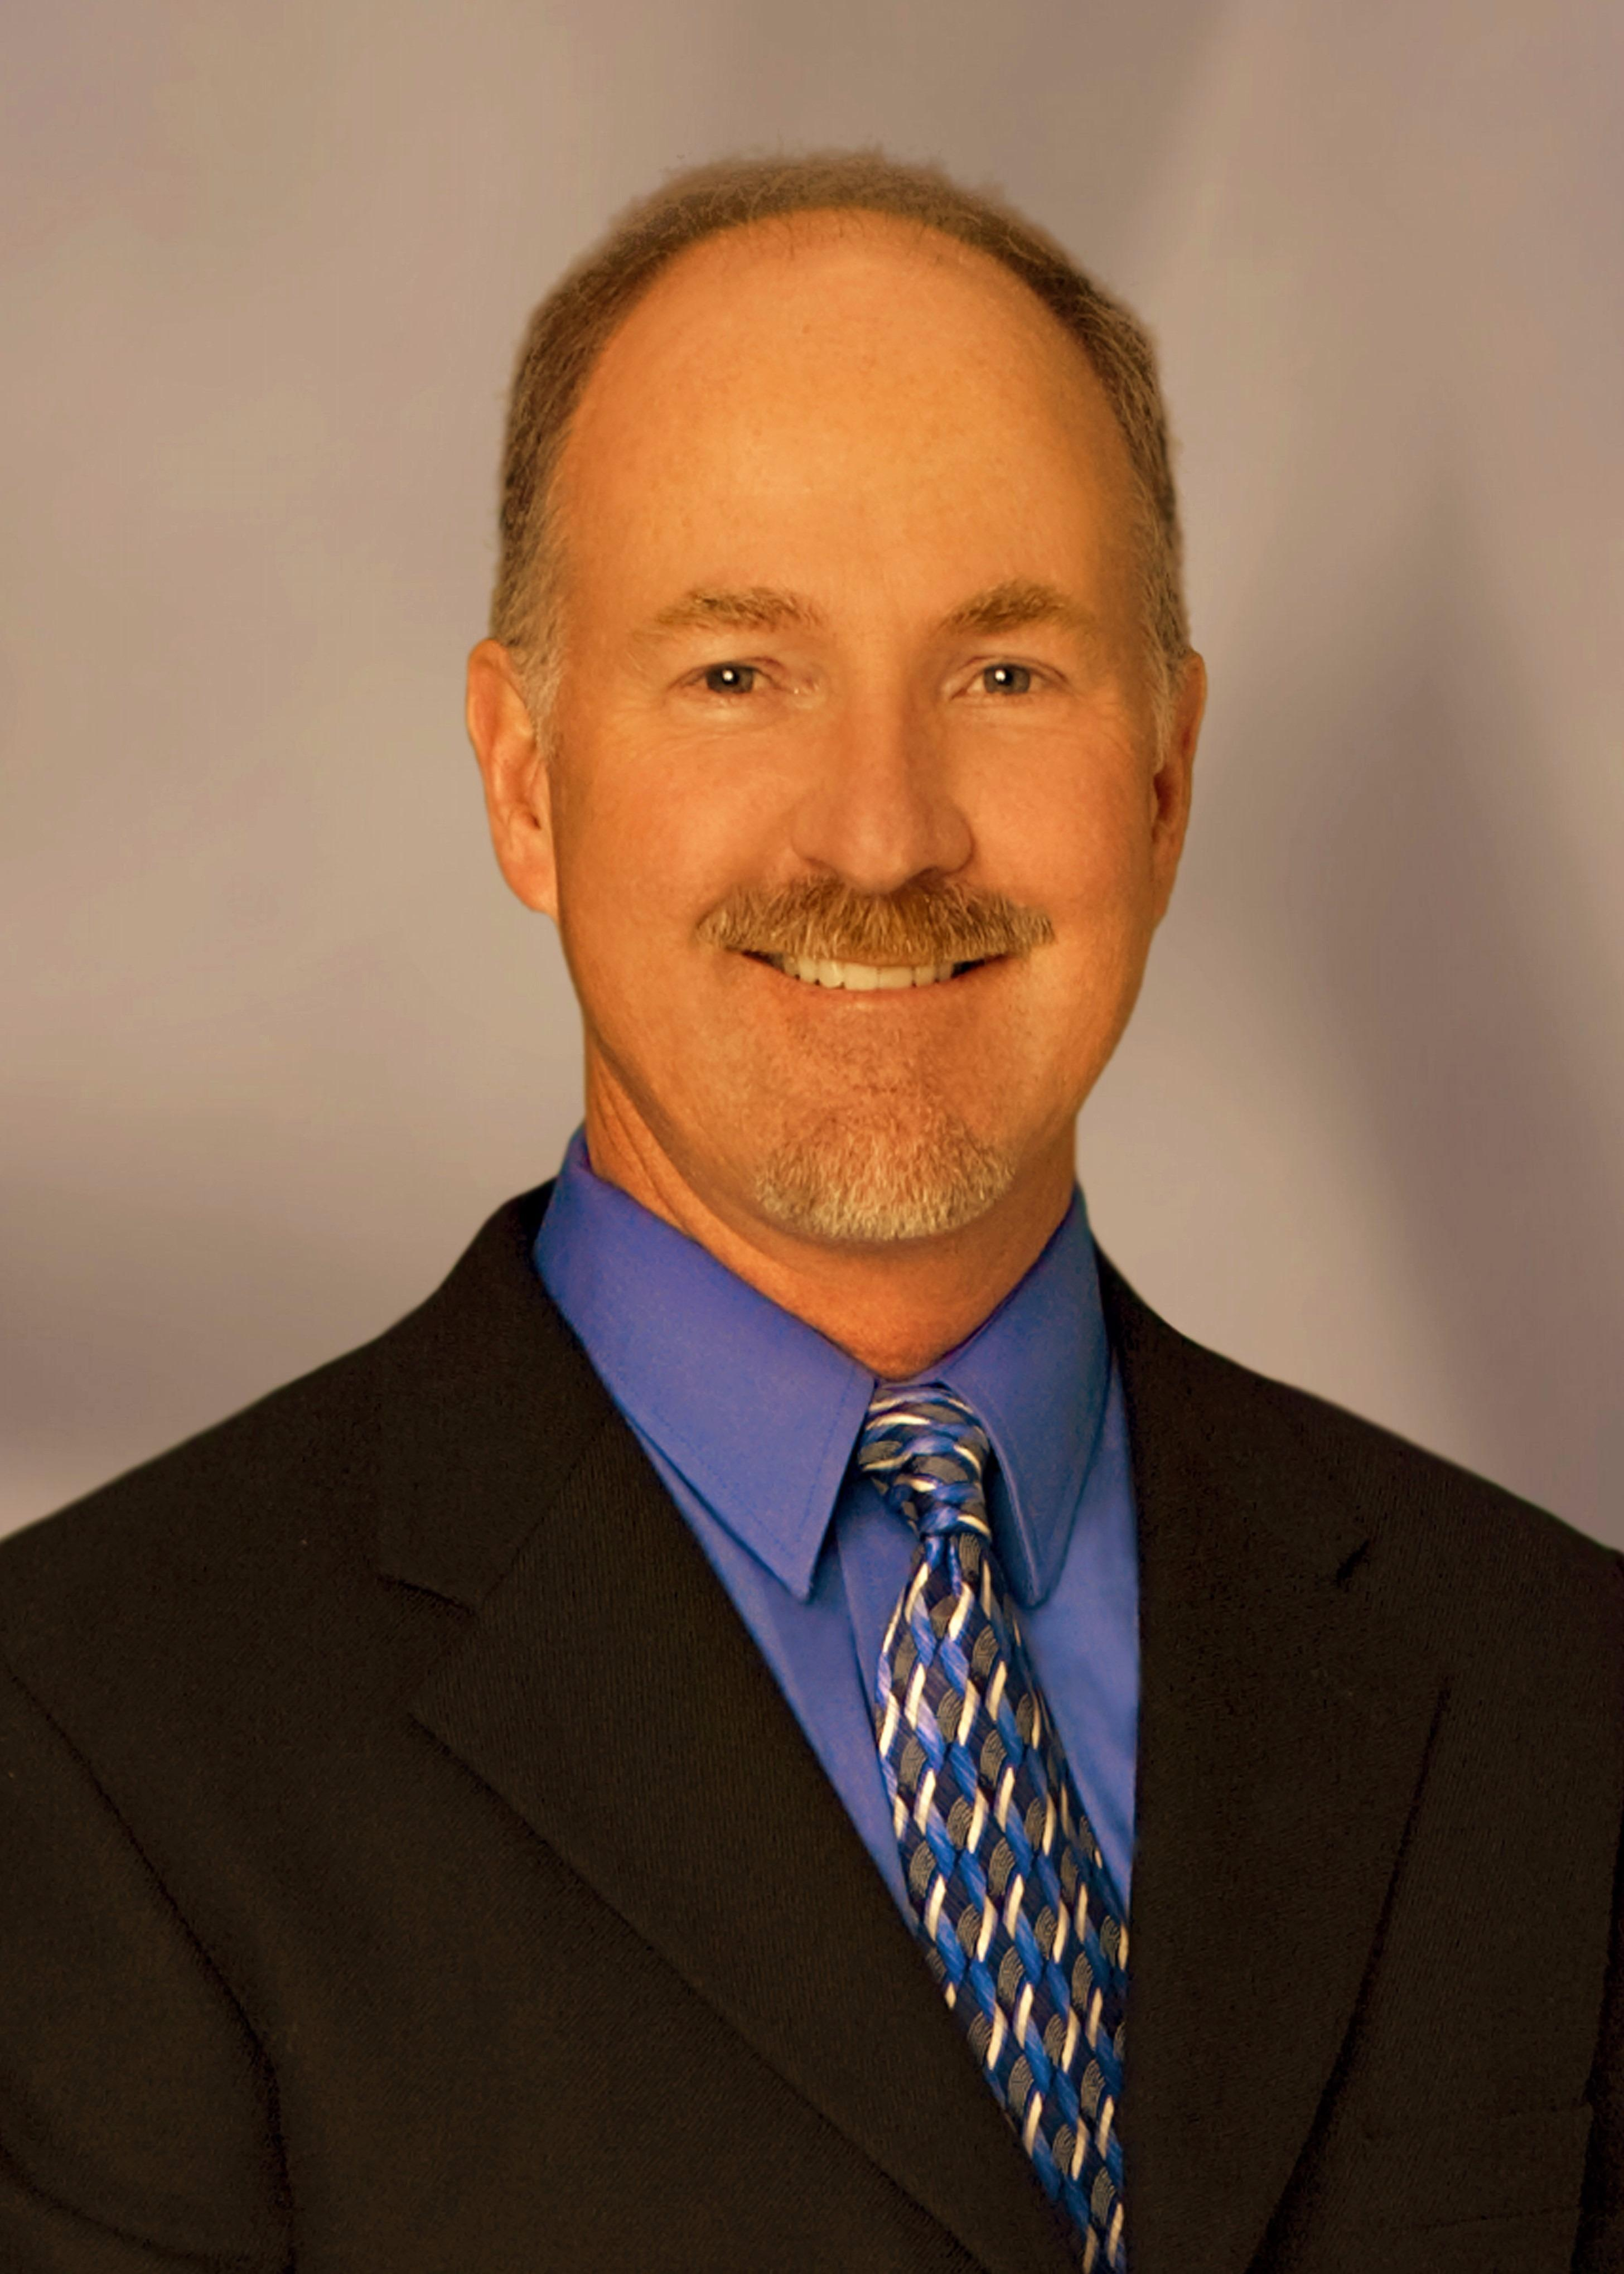 Jim Hammer Financial Services & Insurance - Ridgefield, WA